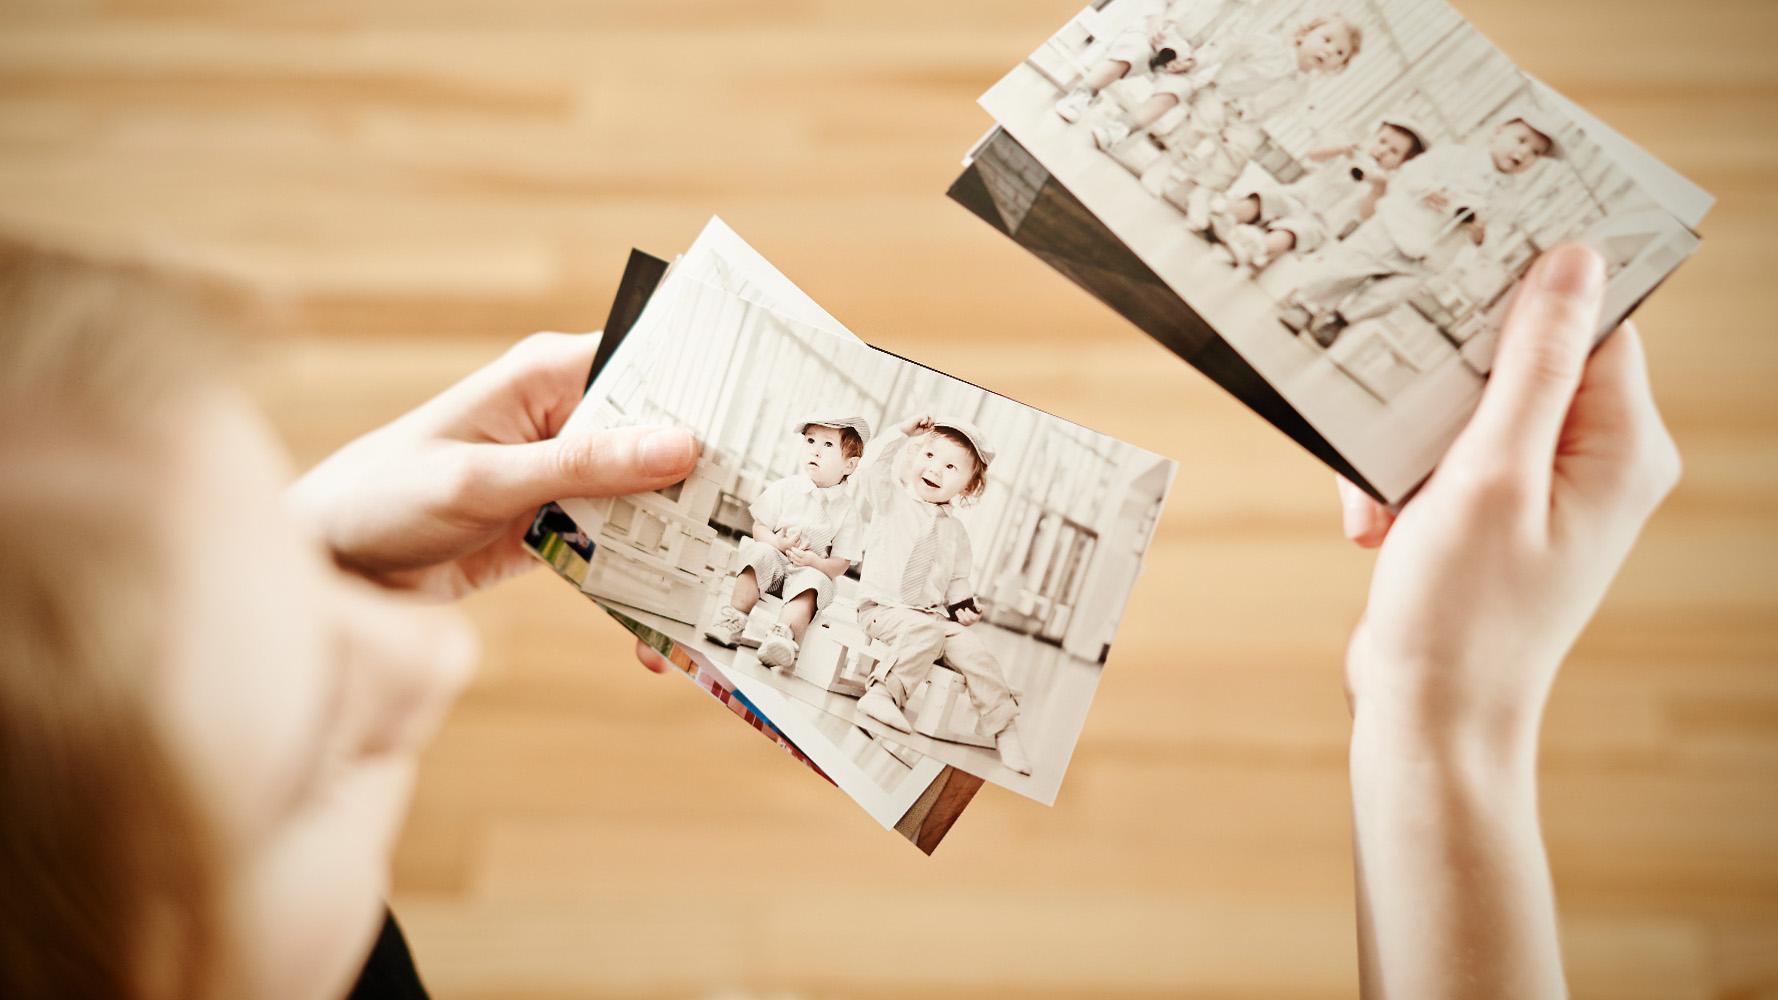 photopoint-photoexpress-online-paberfotode-tellimine